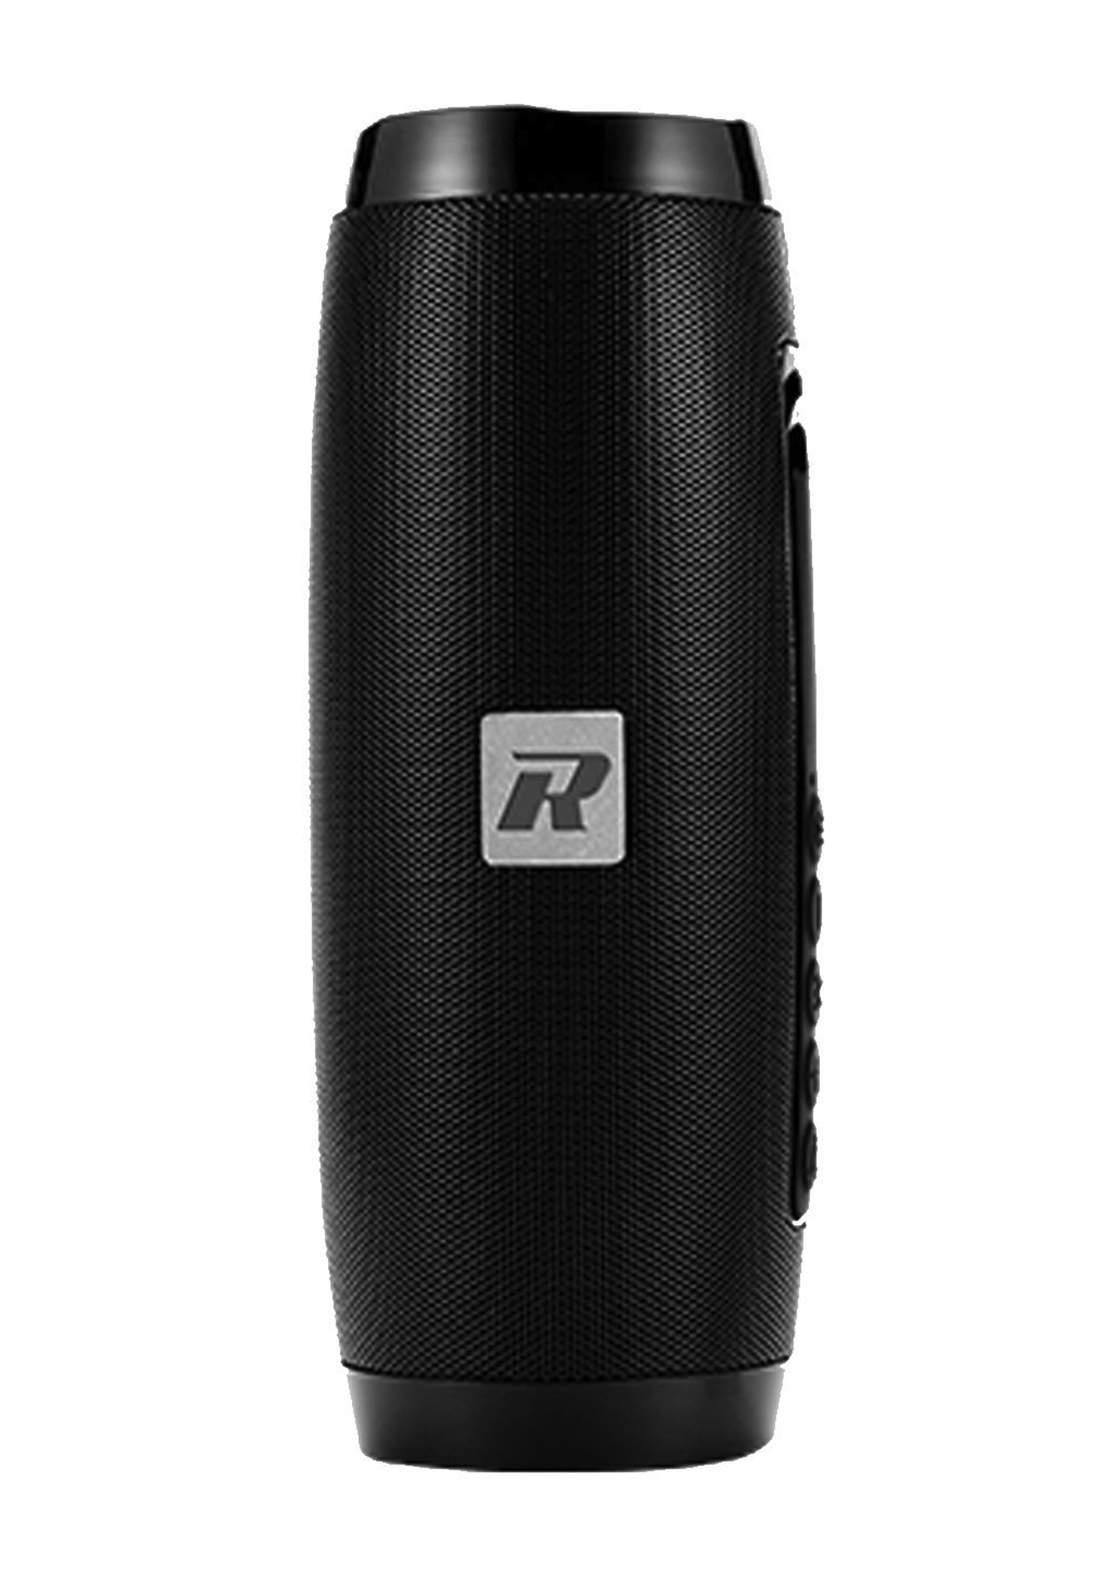 Rockrose Roar D5 10W Bluetooth Portable Speaker - Black مكبر صوت محمول